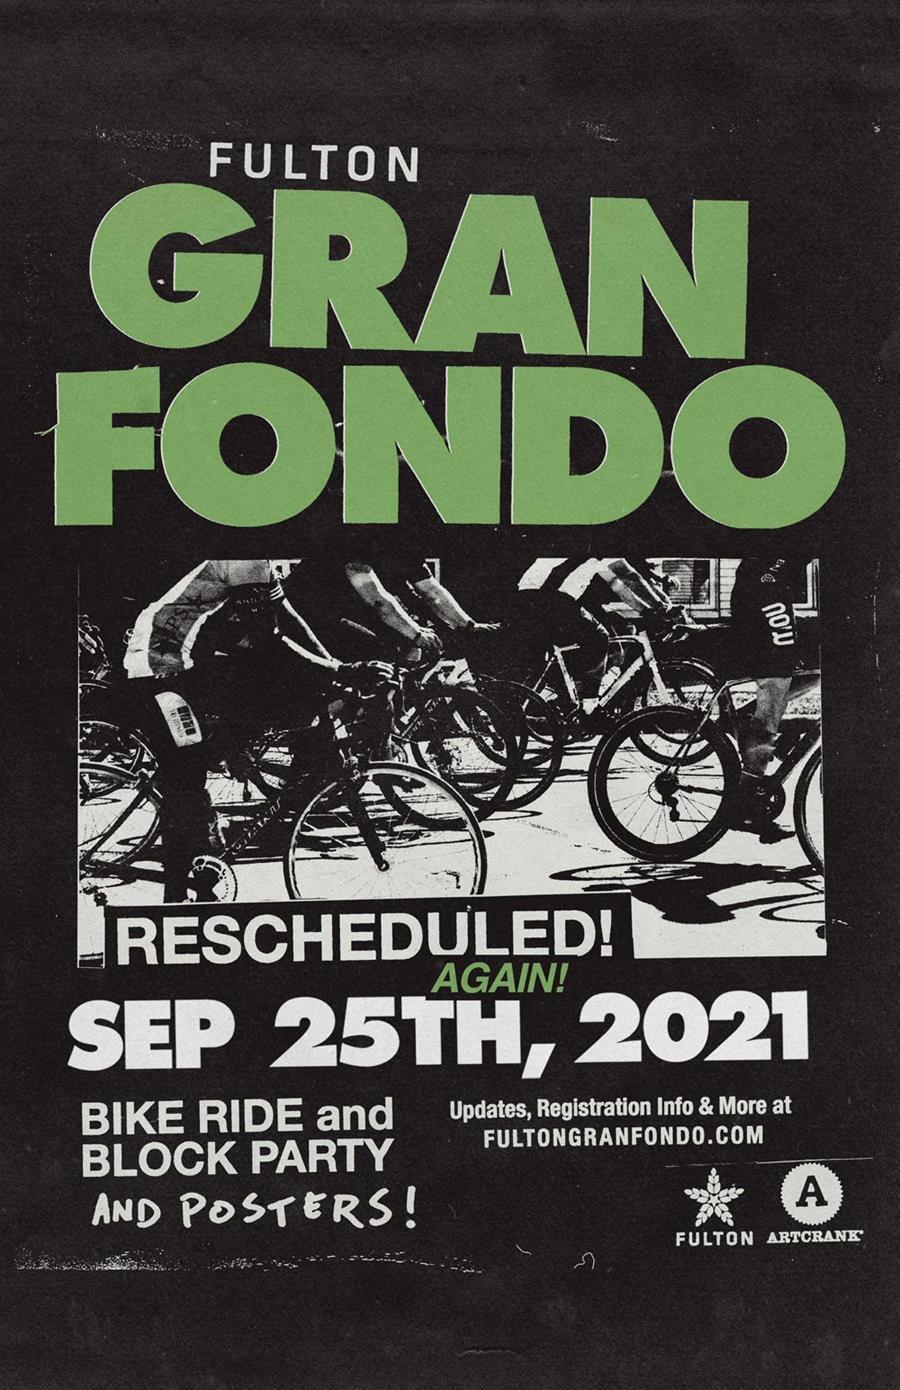 The Fulton Gran Fondo is 9/25/21